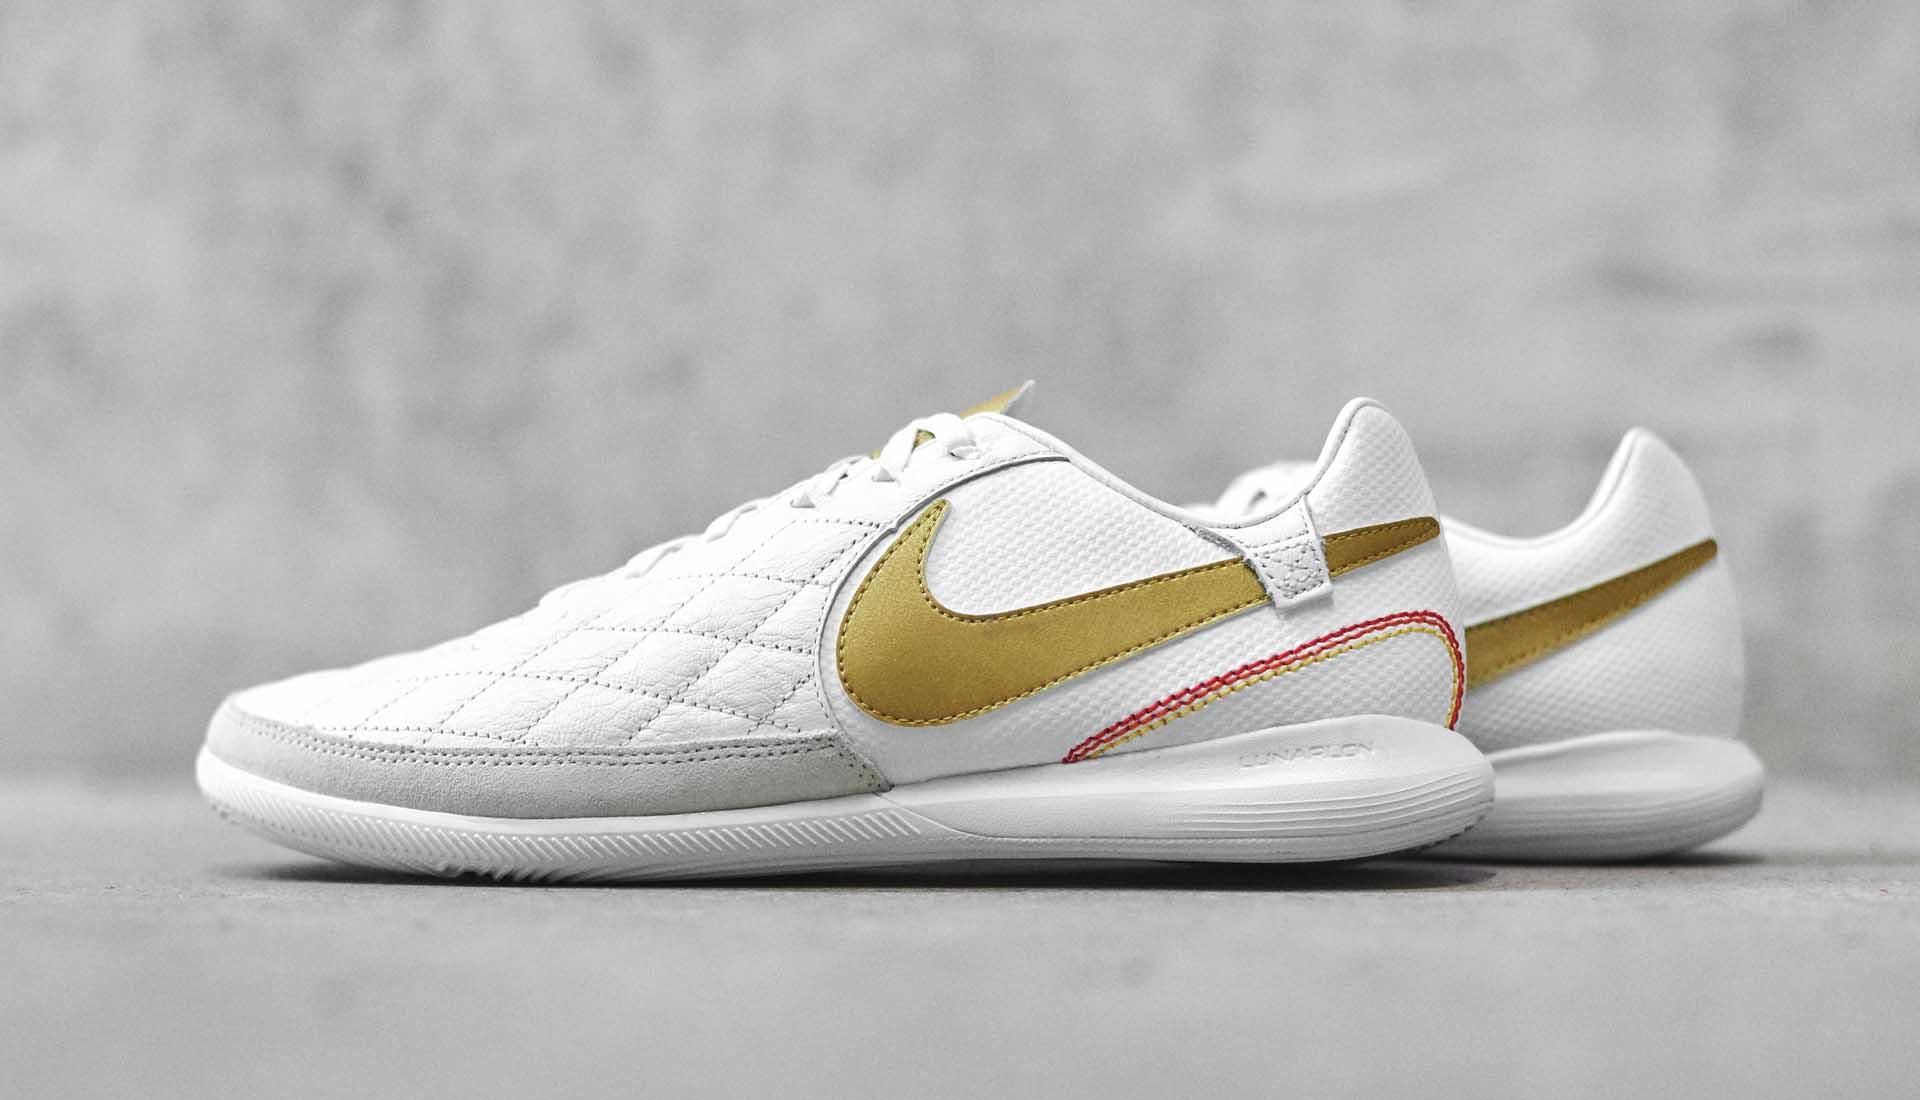 chaussures-football-Nike-Tiempo-X-10R-Barcelone-img1